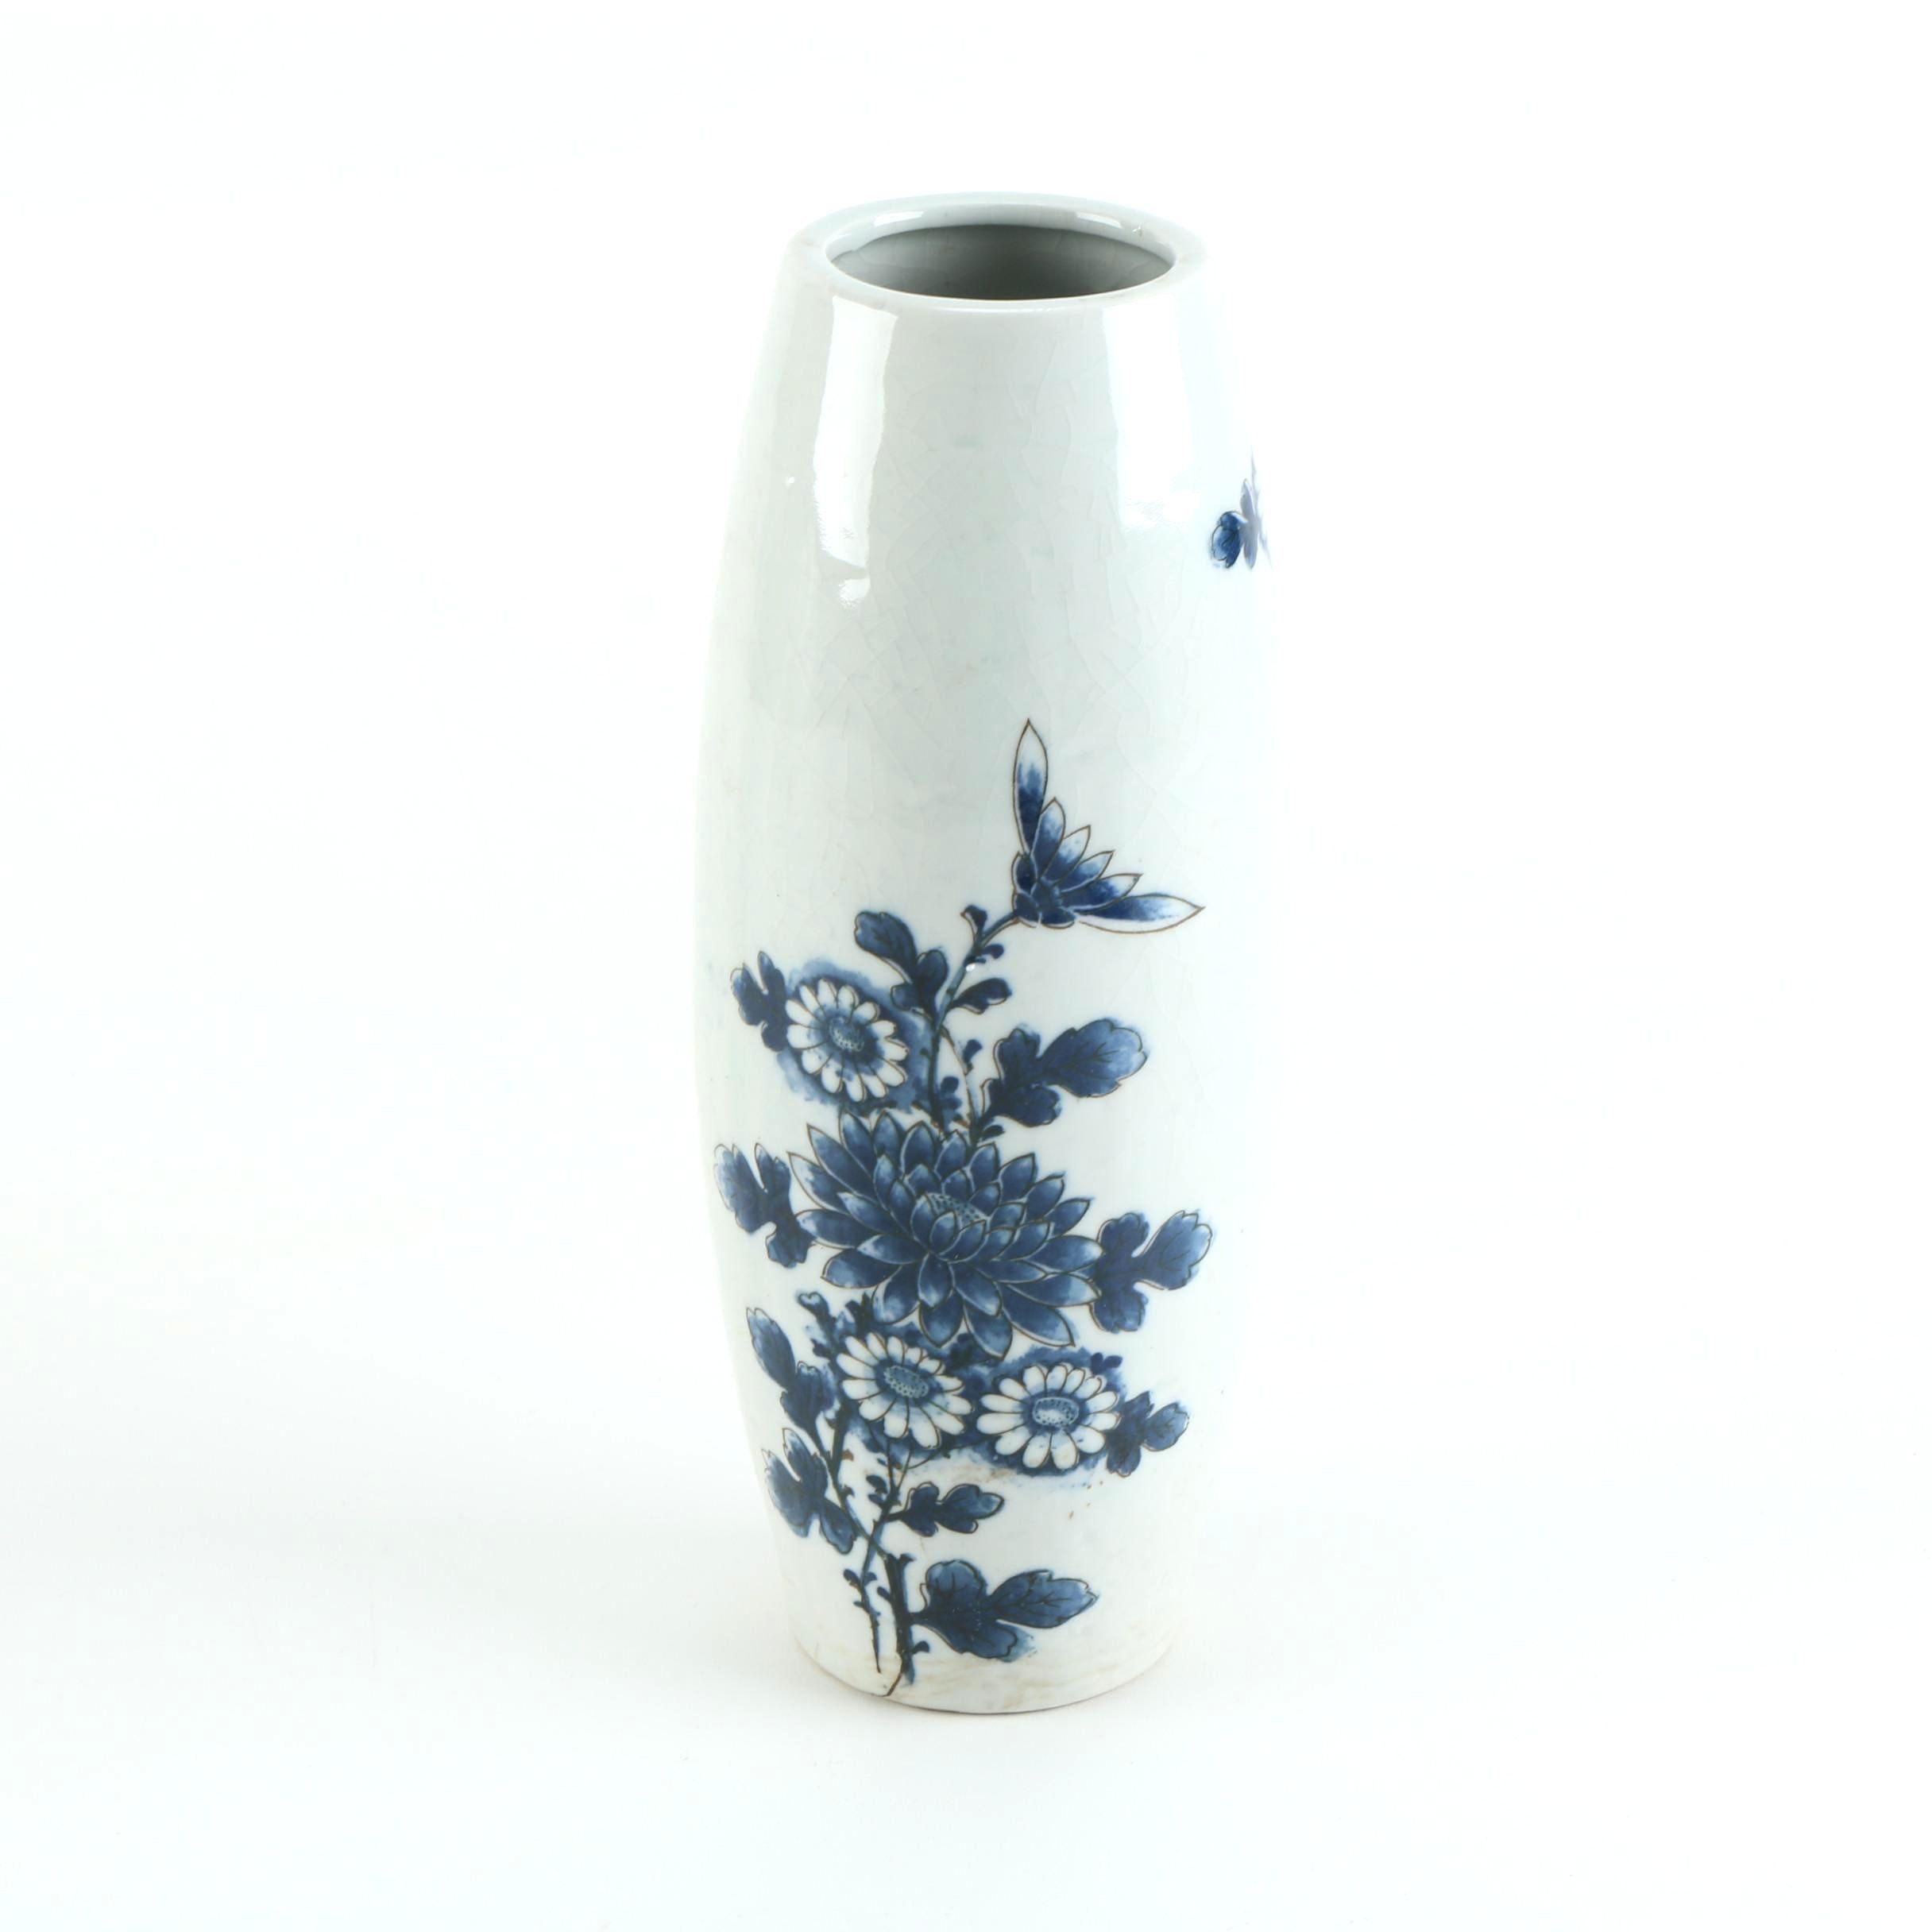 Floral Printed Decorative Vase